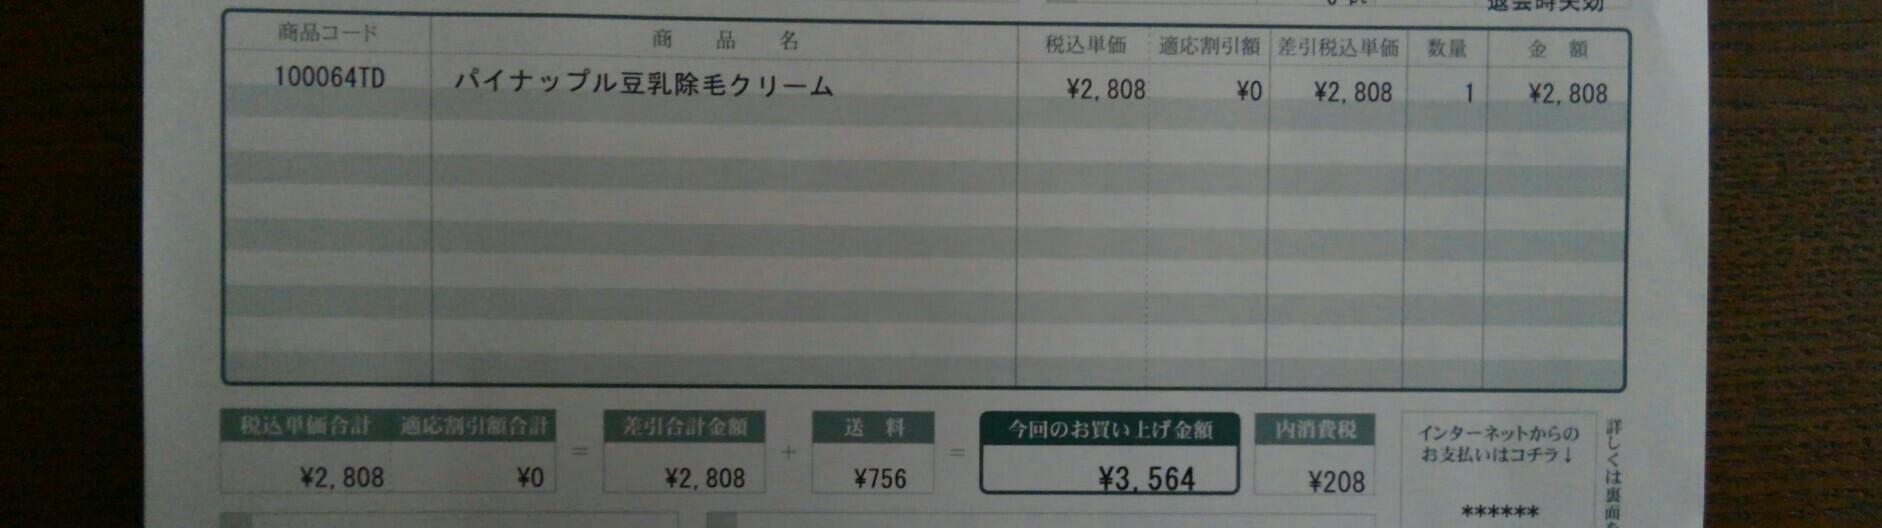 f:id:shihomaru:20171129165622j:image